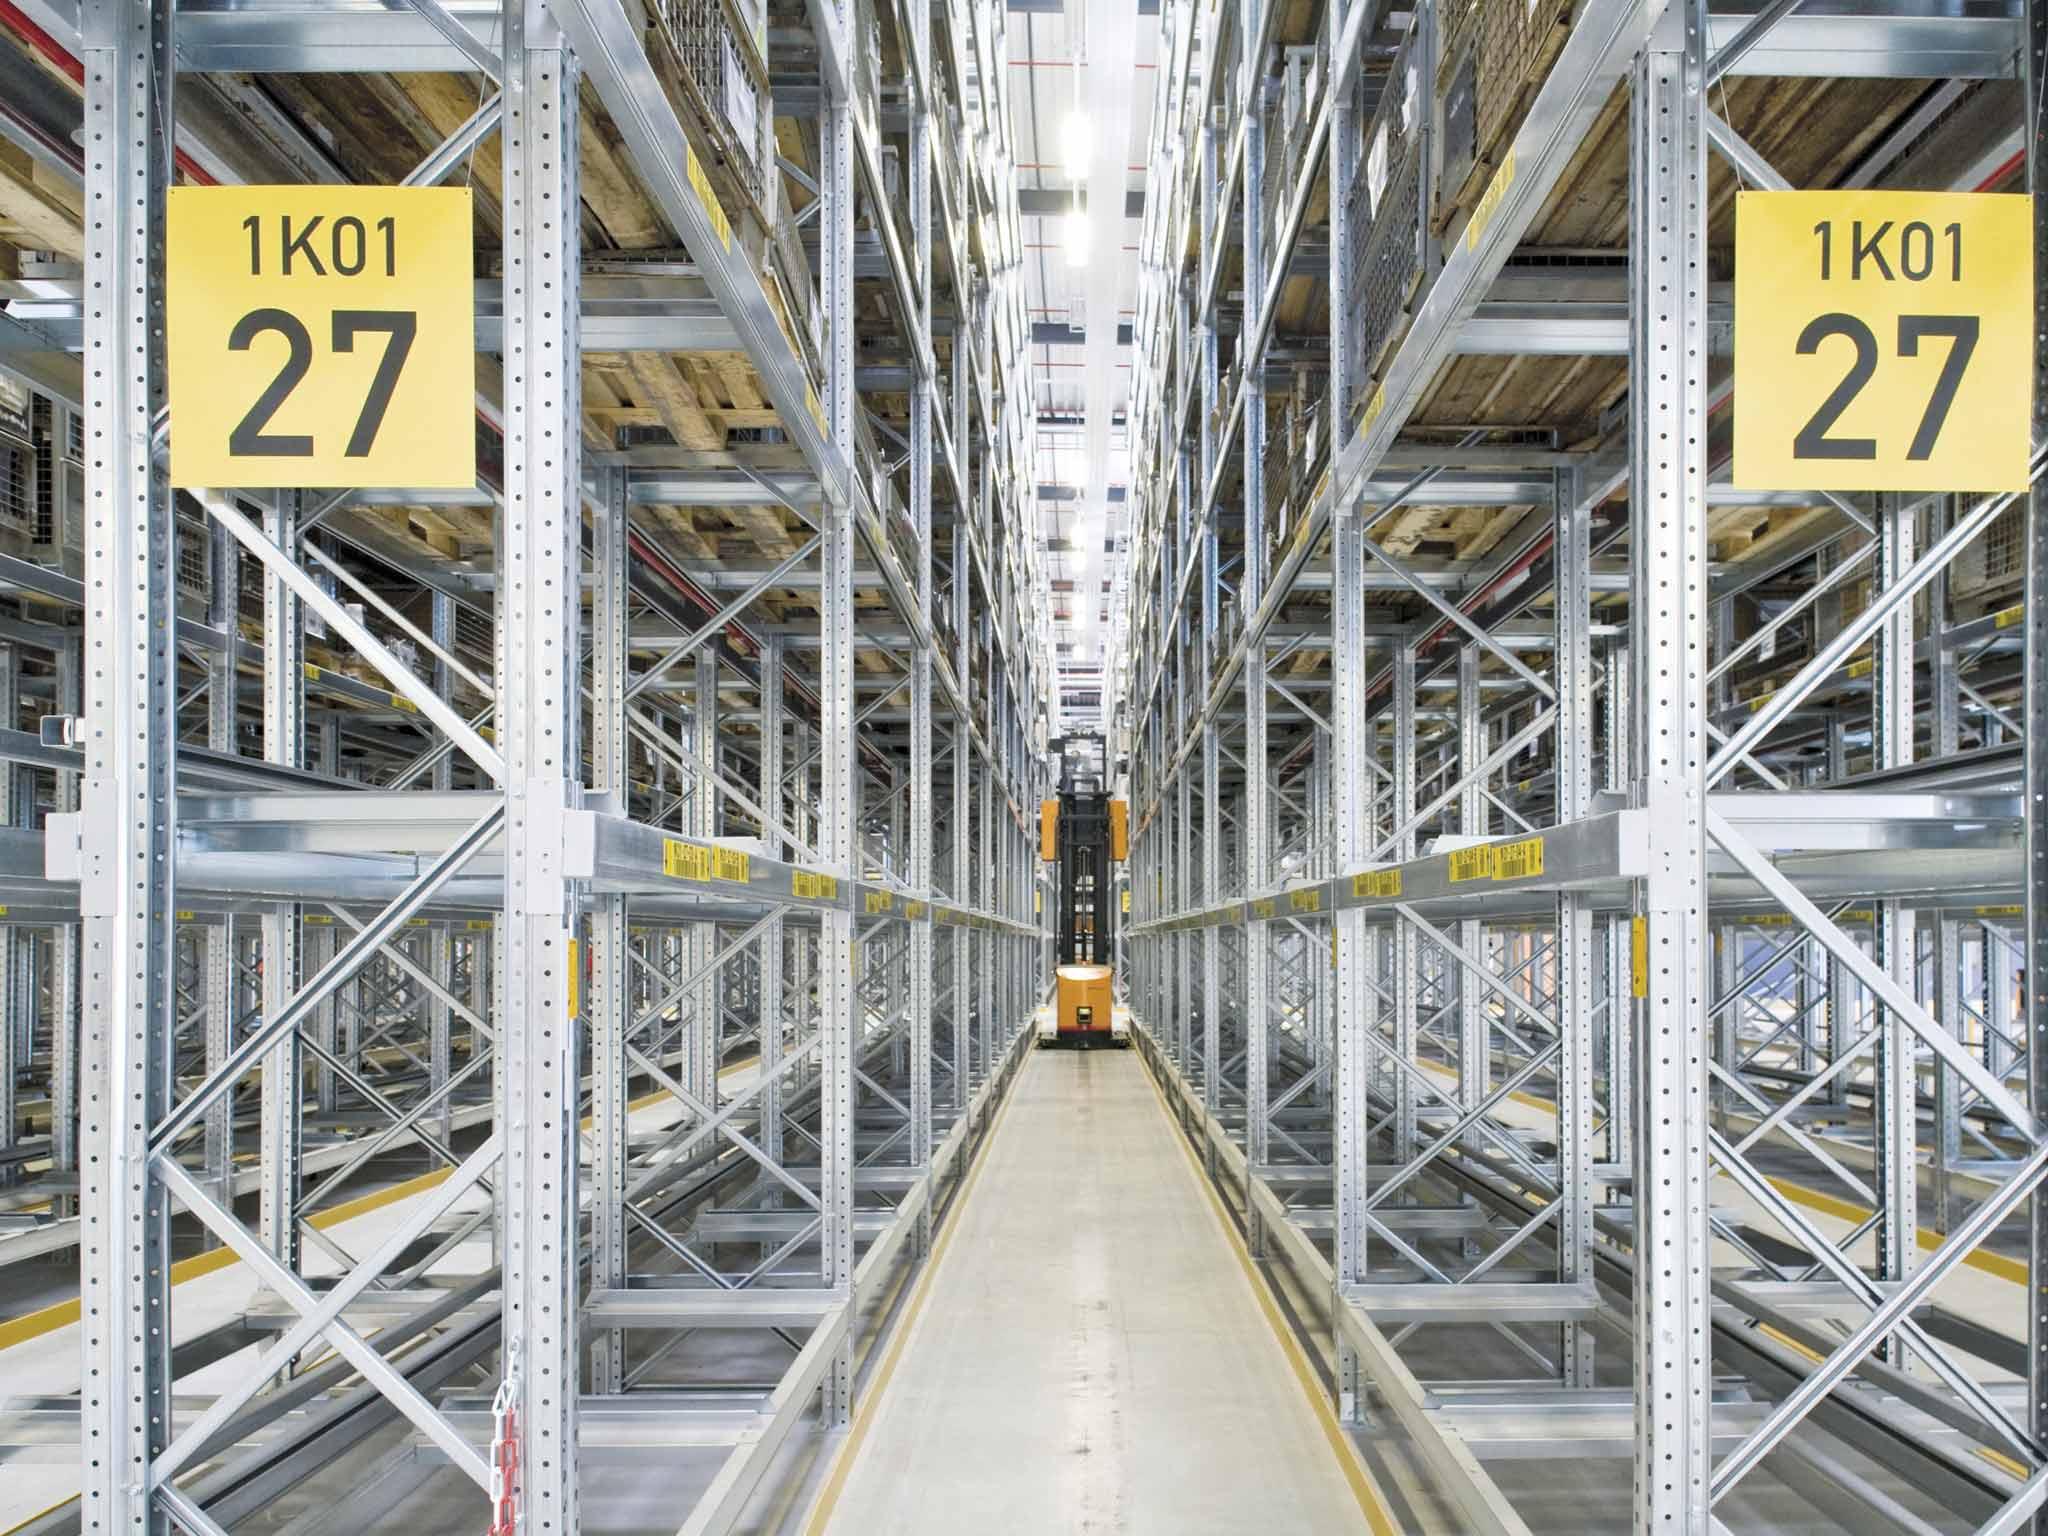 Pallet Racking Amp Warehouse Racking Systems Csi Group